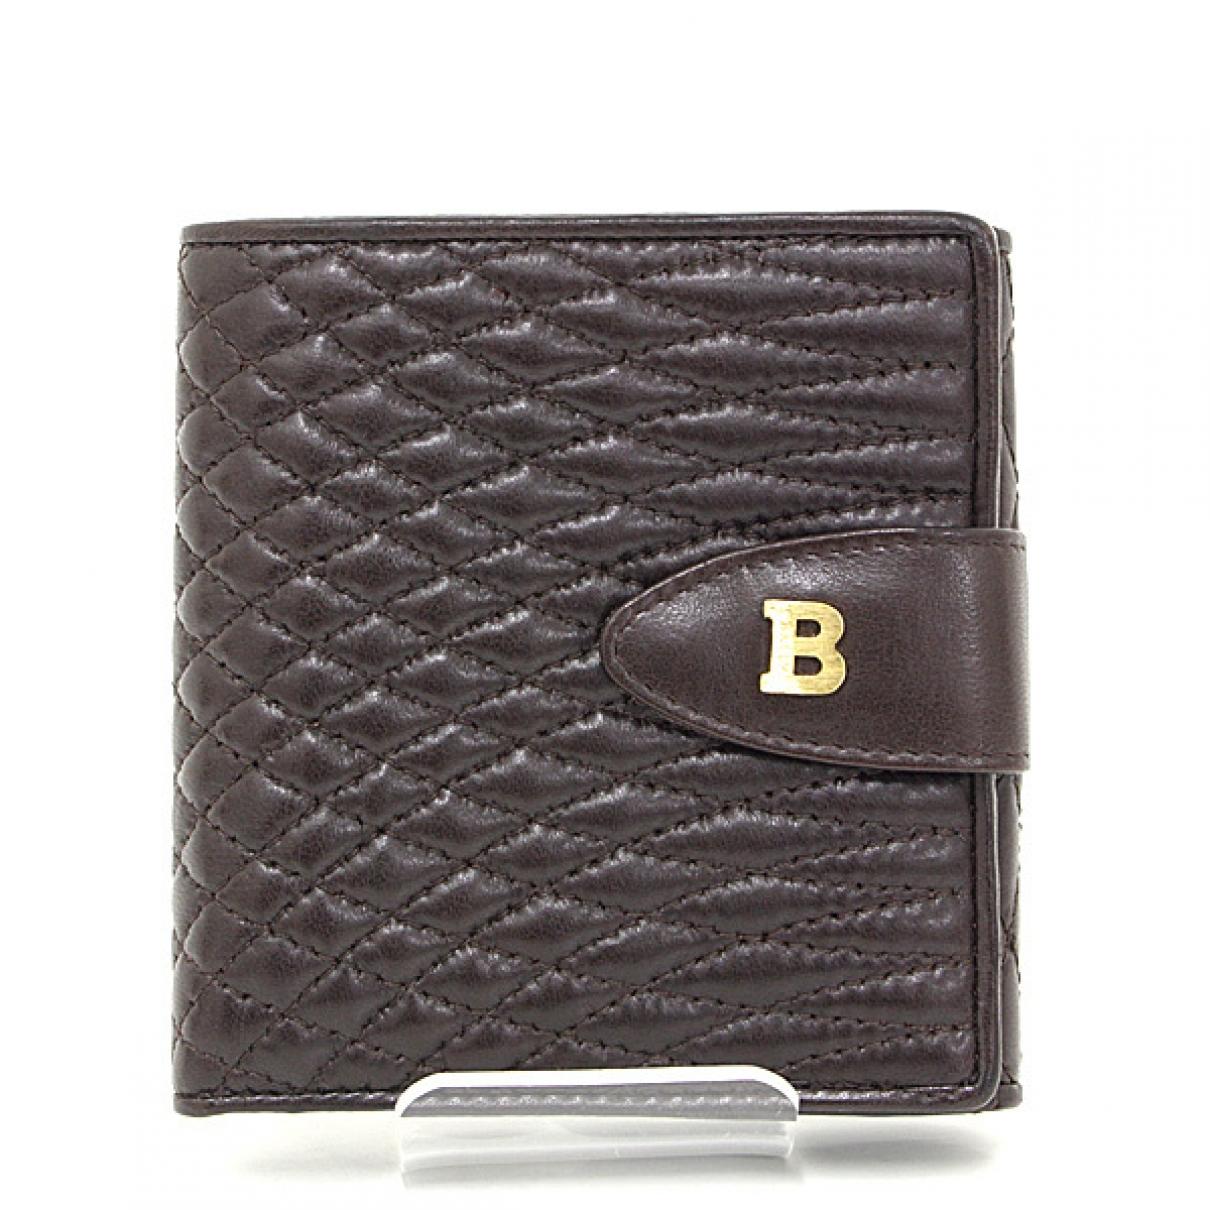 Bally - Portefeuille   pour femme en cuir - marron